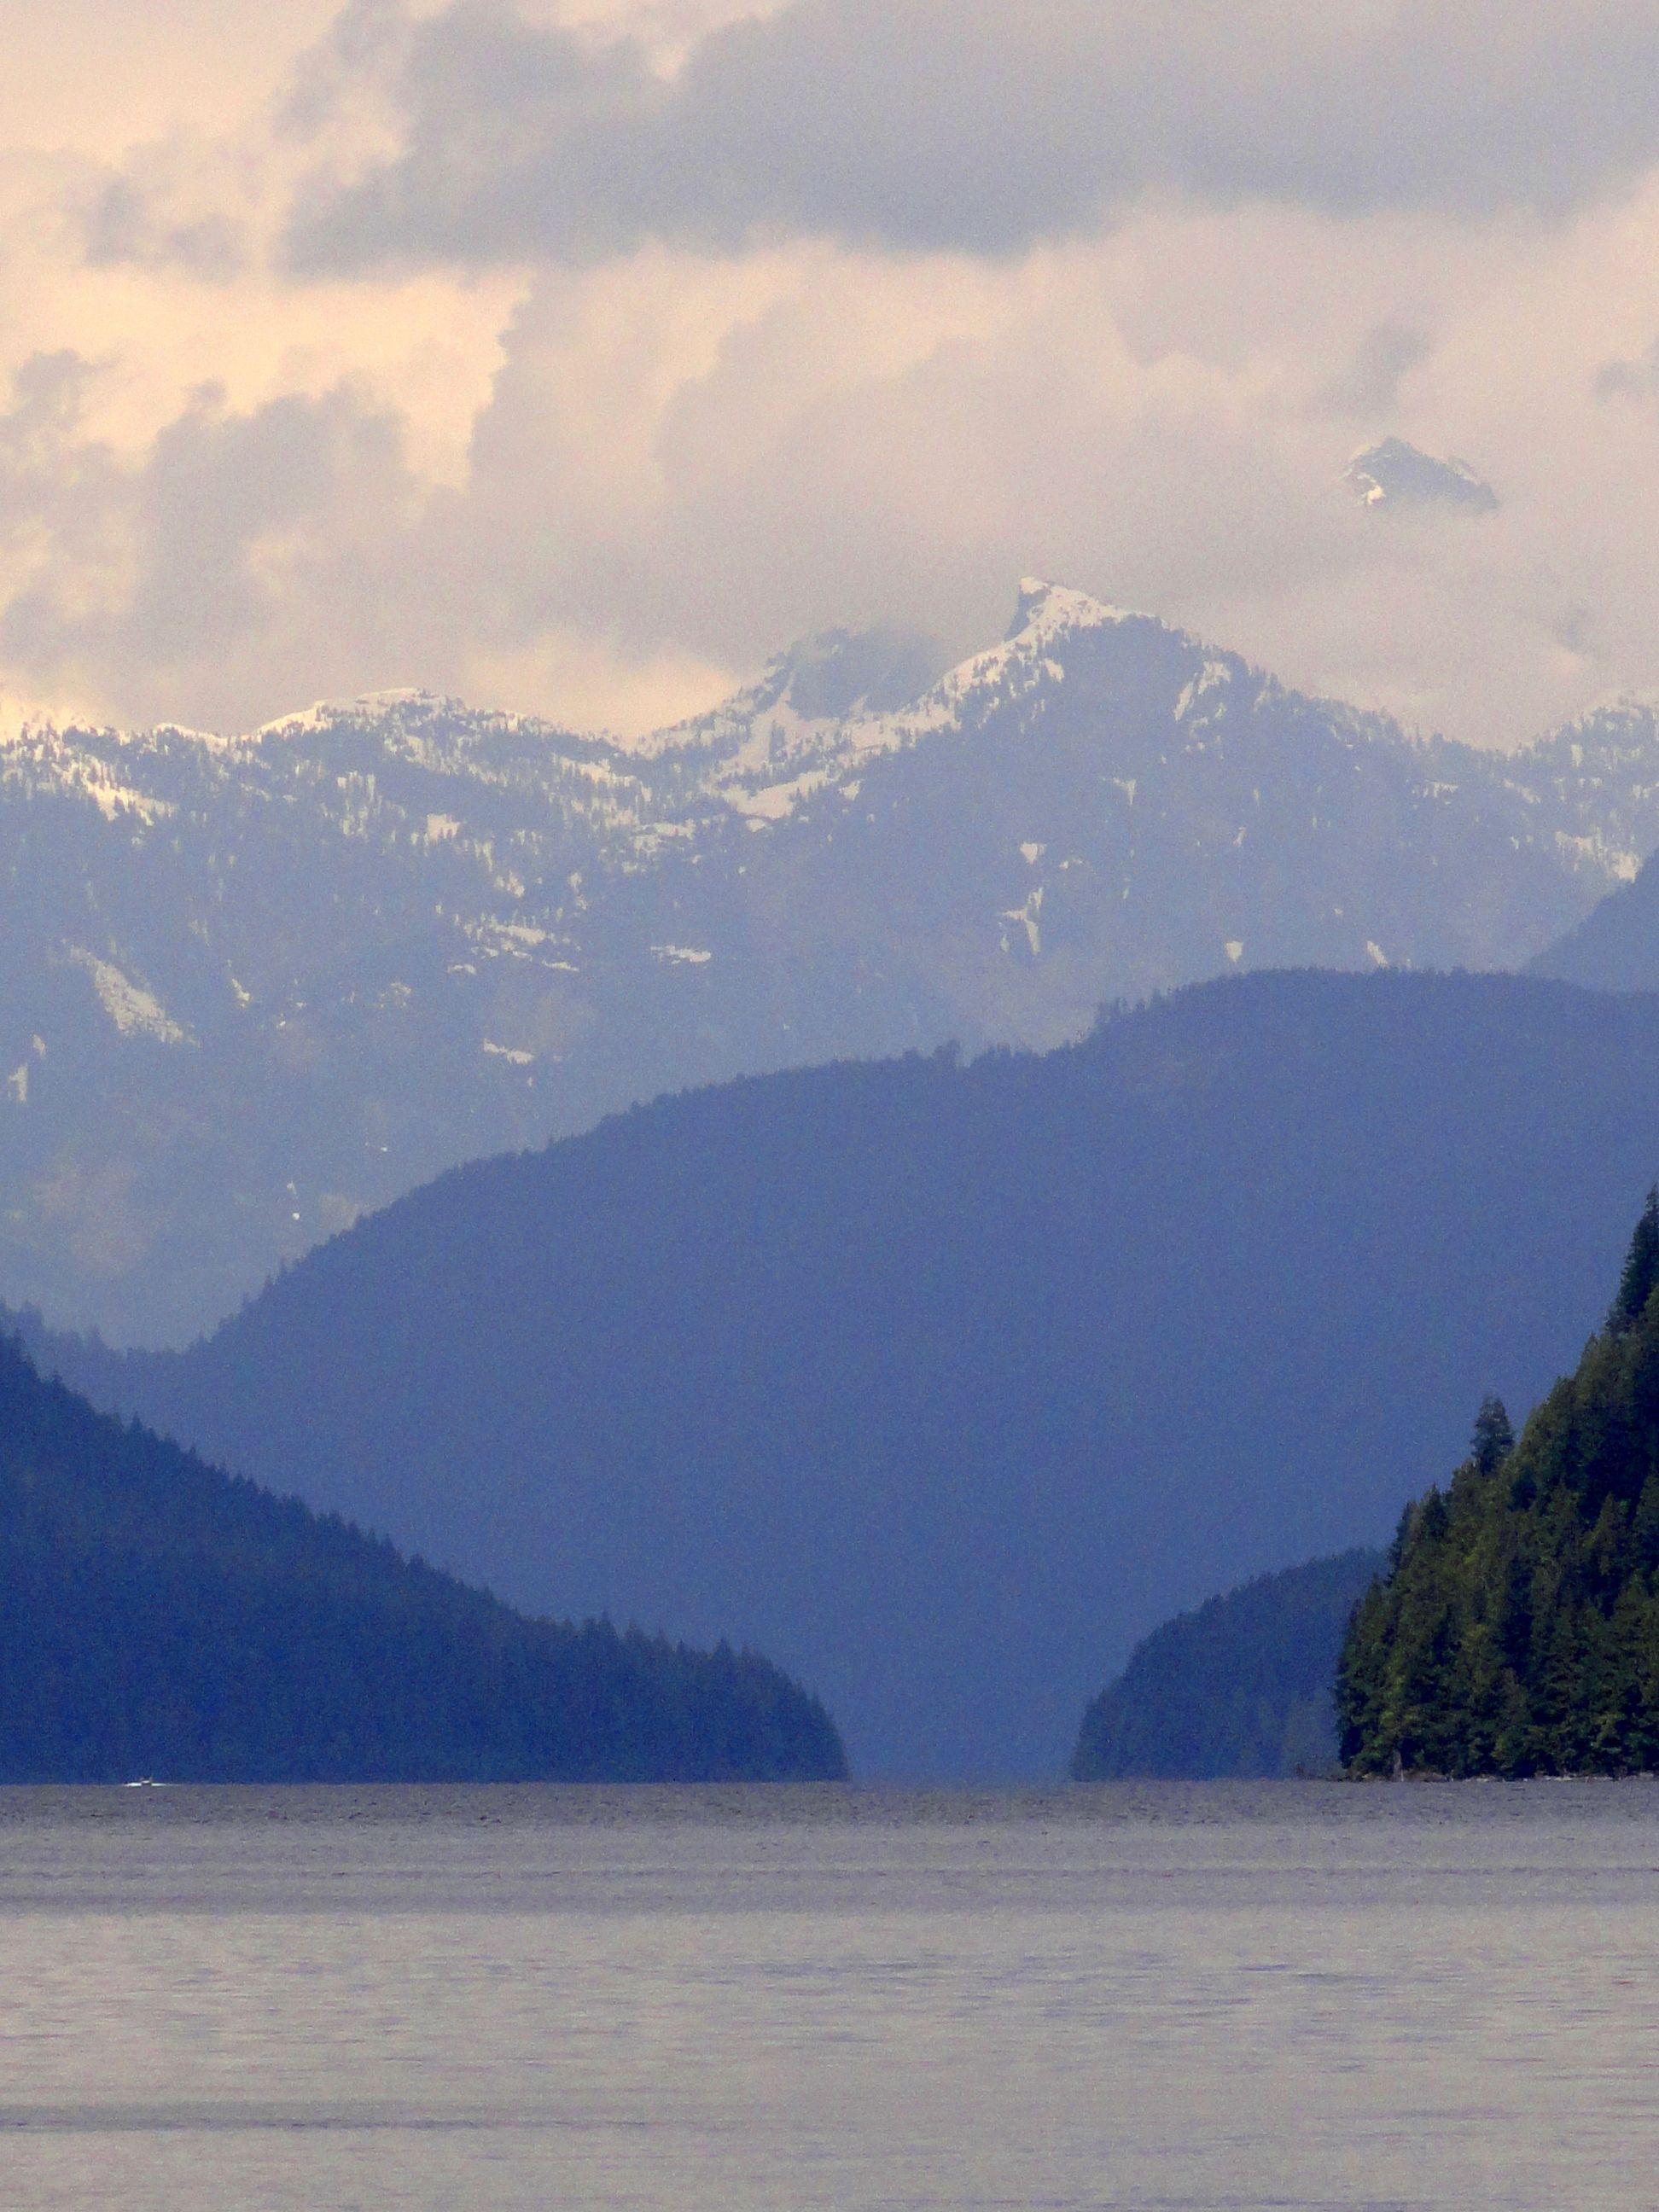 Alouette Lake, Golden Ears Provincial Park, Maple Ridge